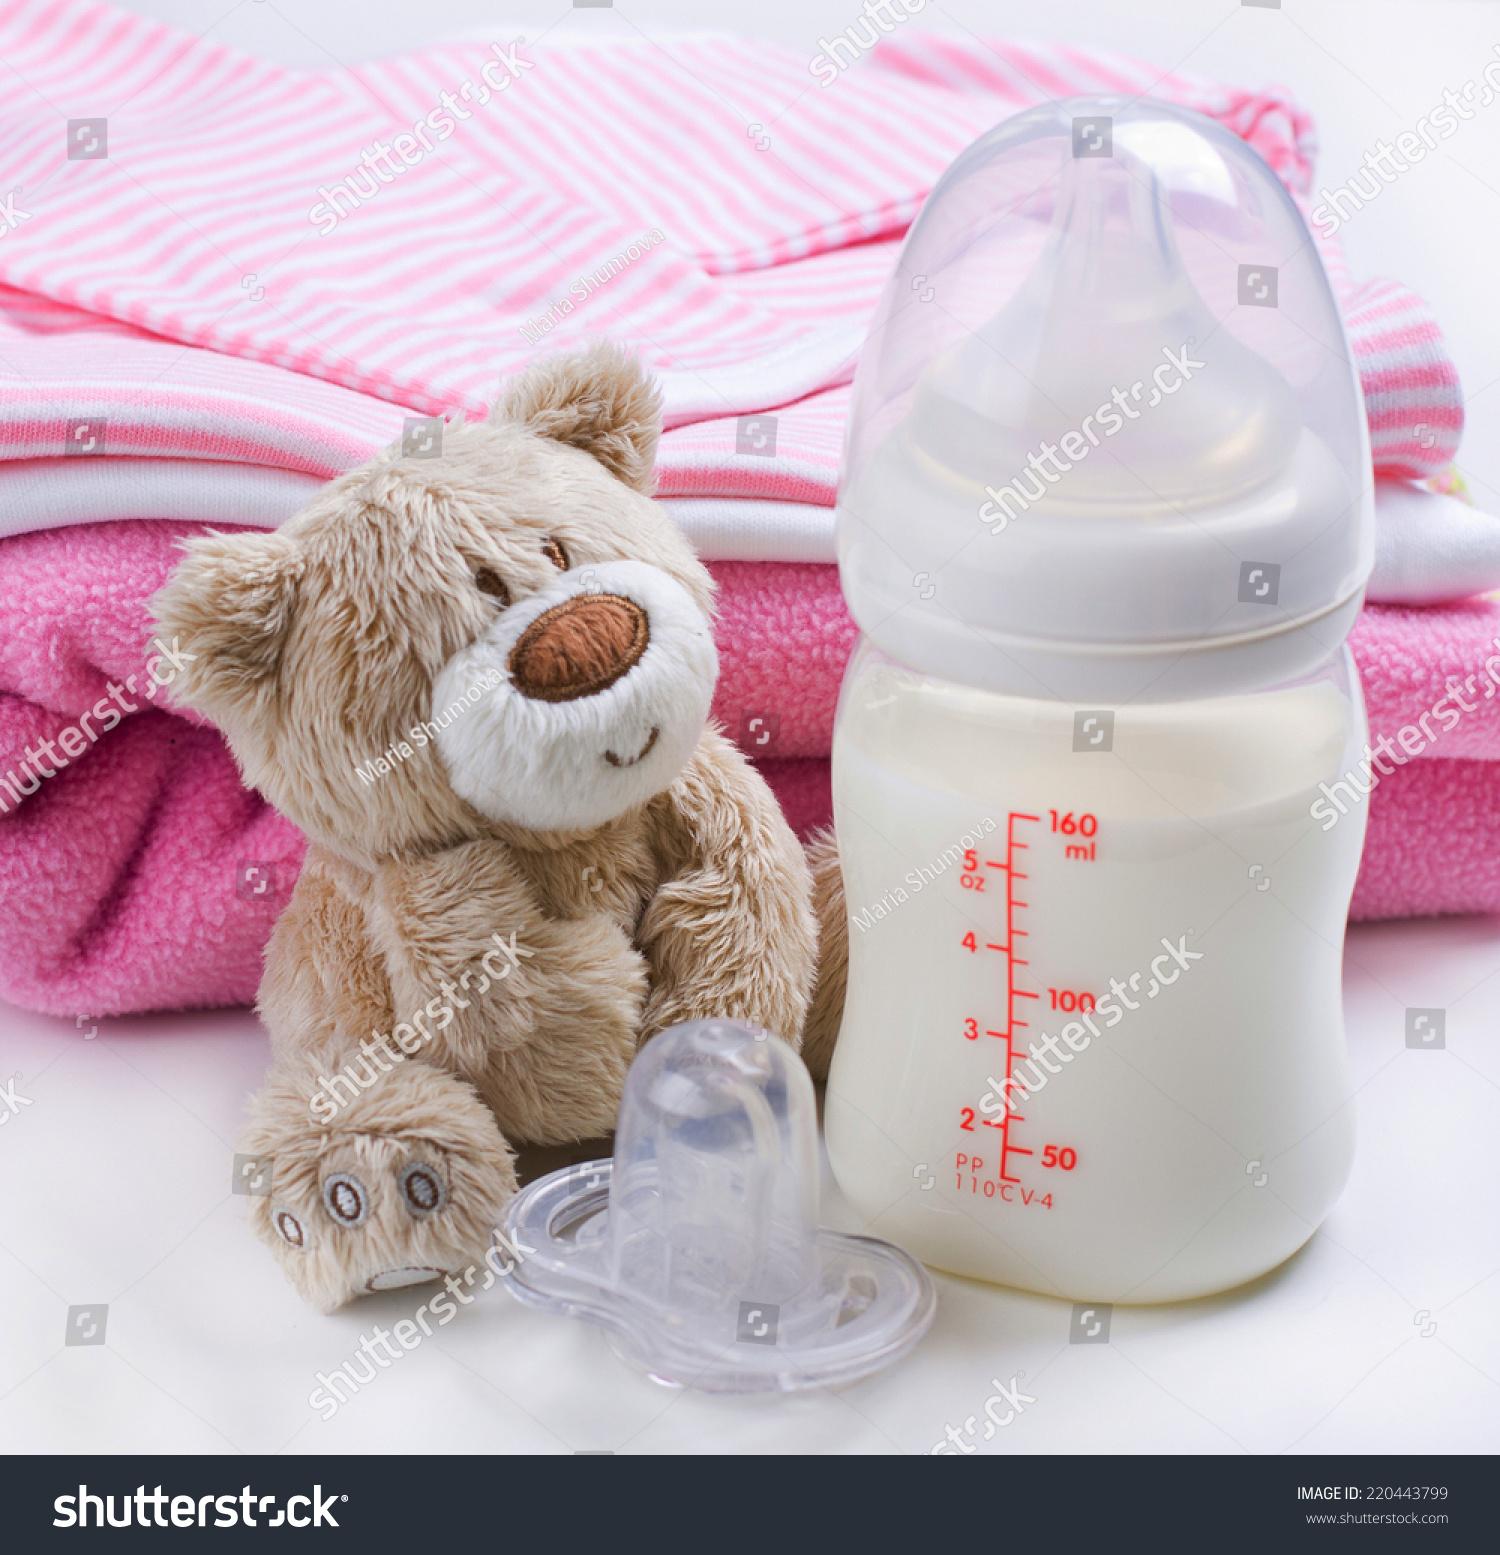 2c191e3c2 Baby Girls Stuff Including Bottle Milk Stock Photo (Edit Now ...